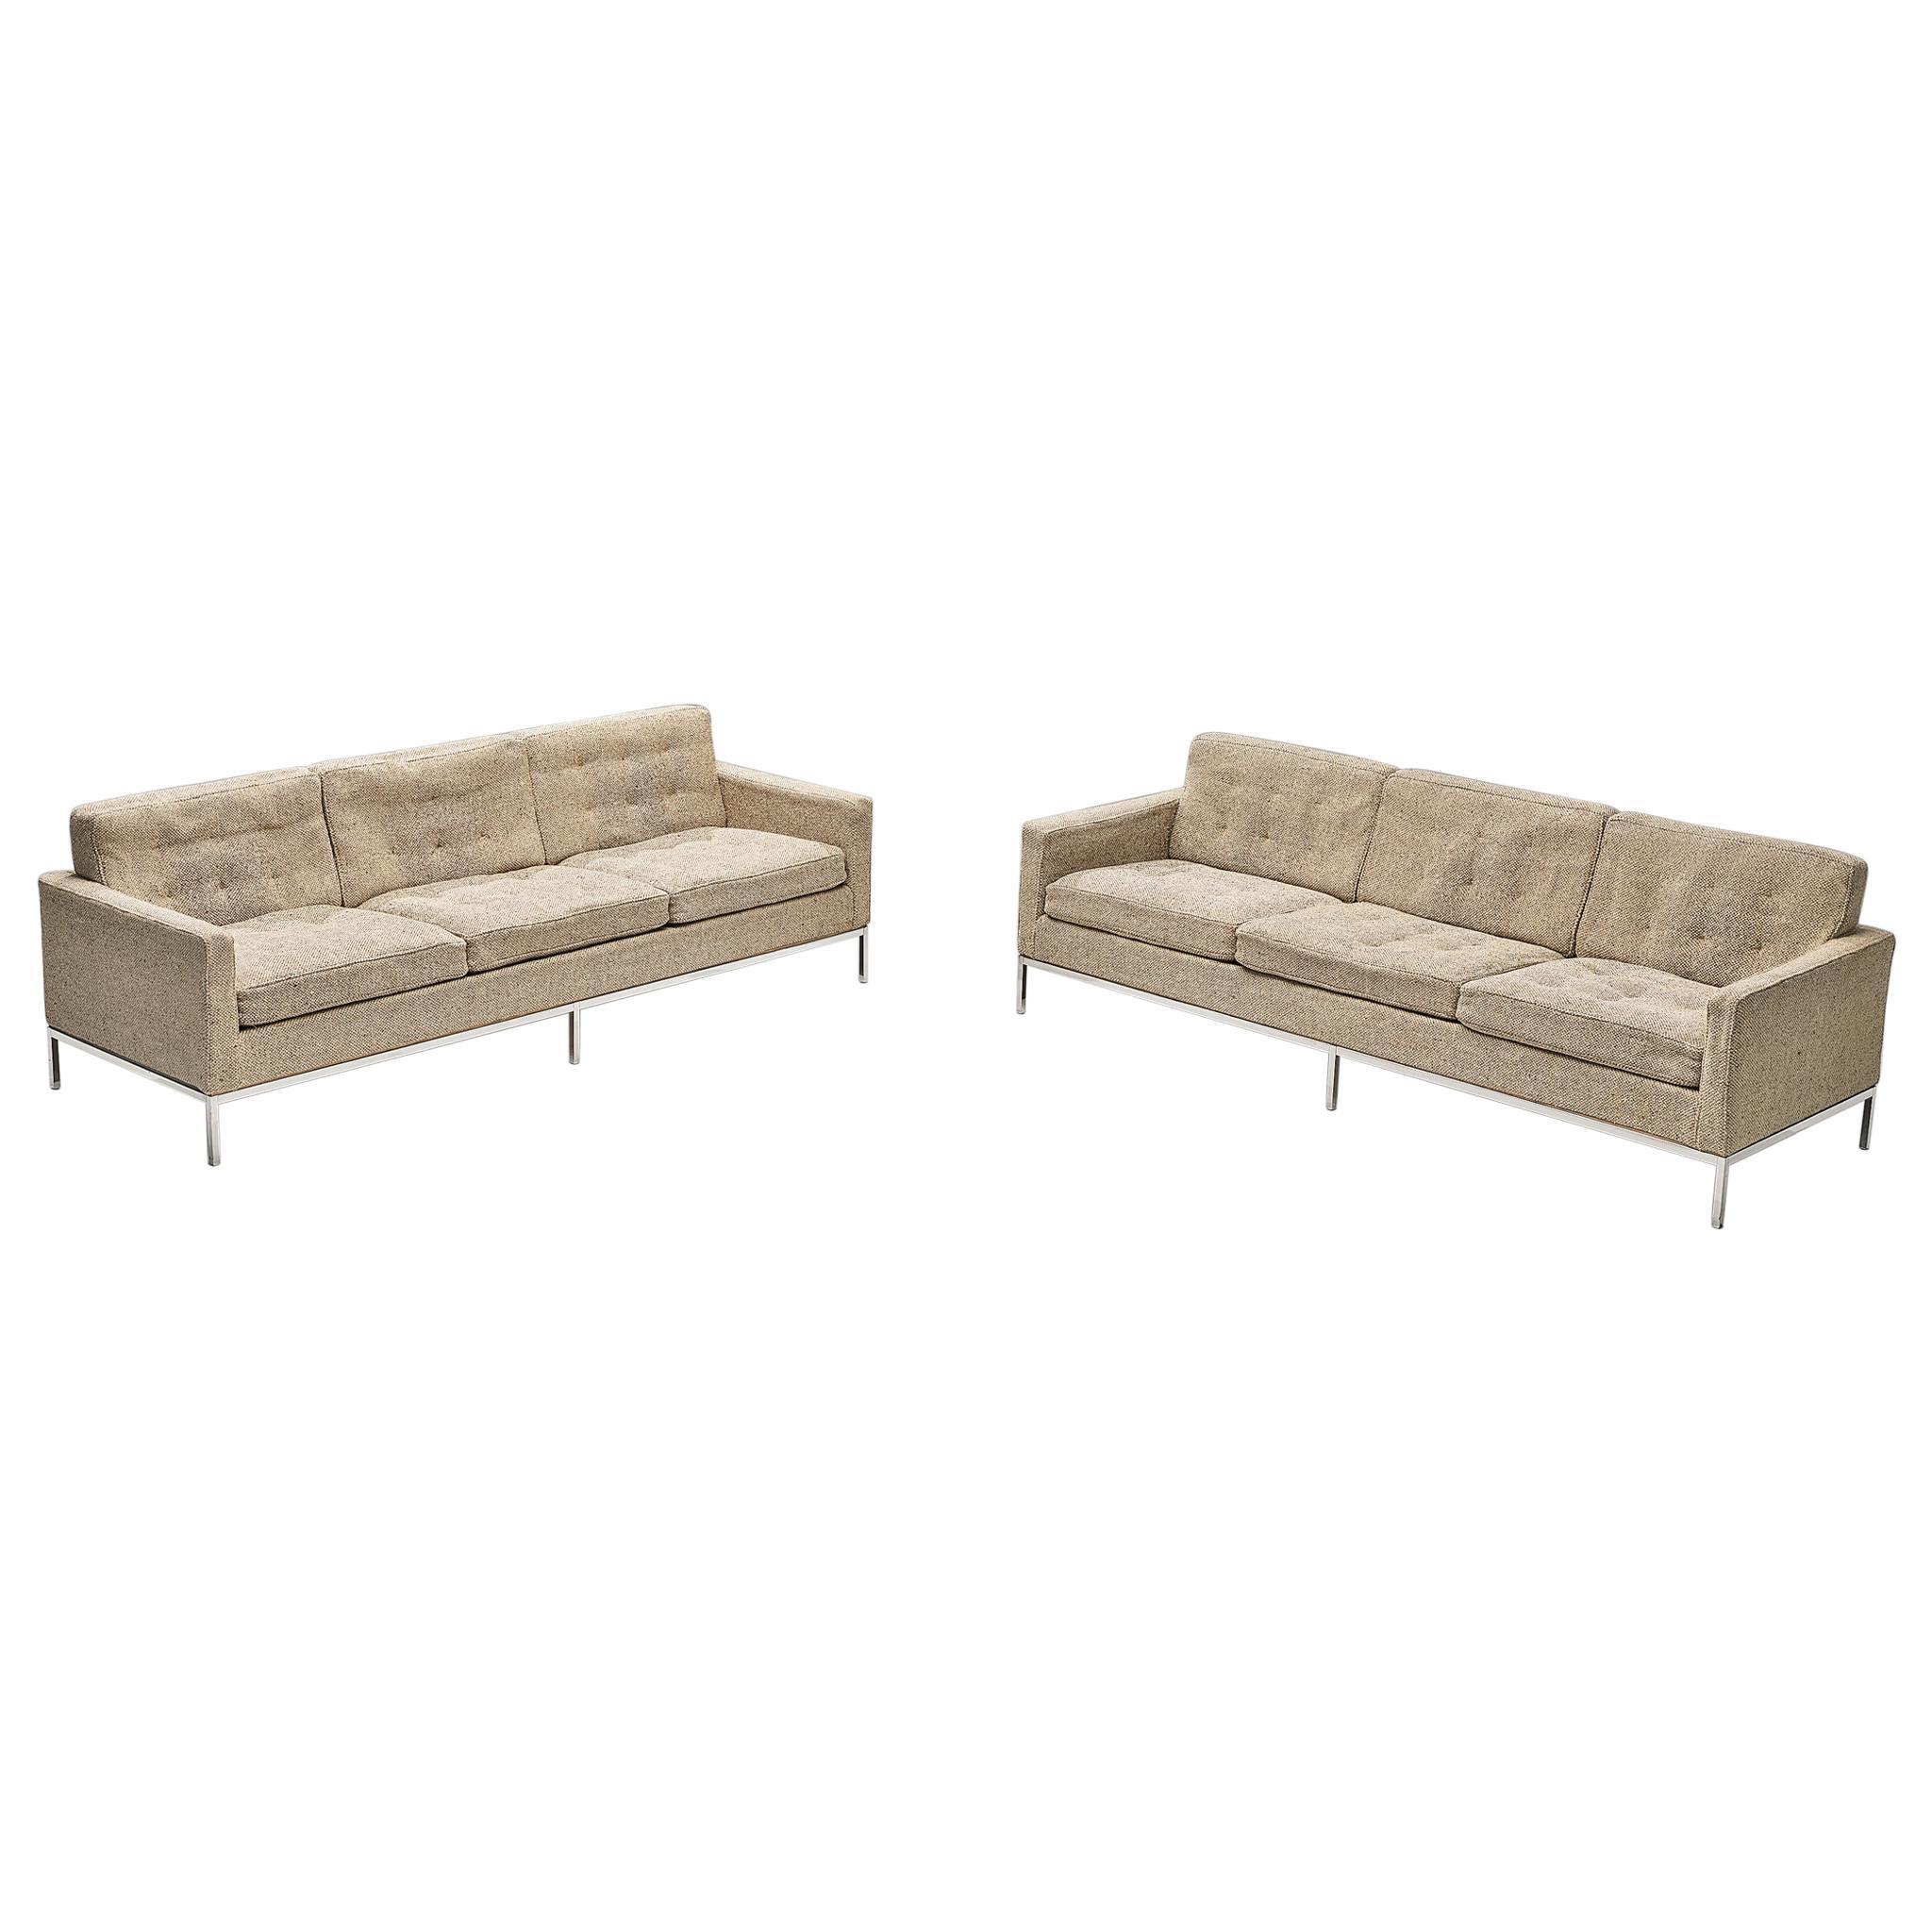 Artifort Sofa Model '905' in Metal and Fabric Upholstery